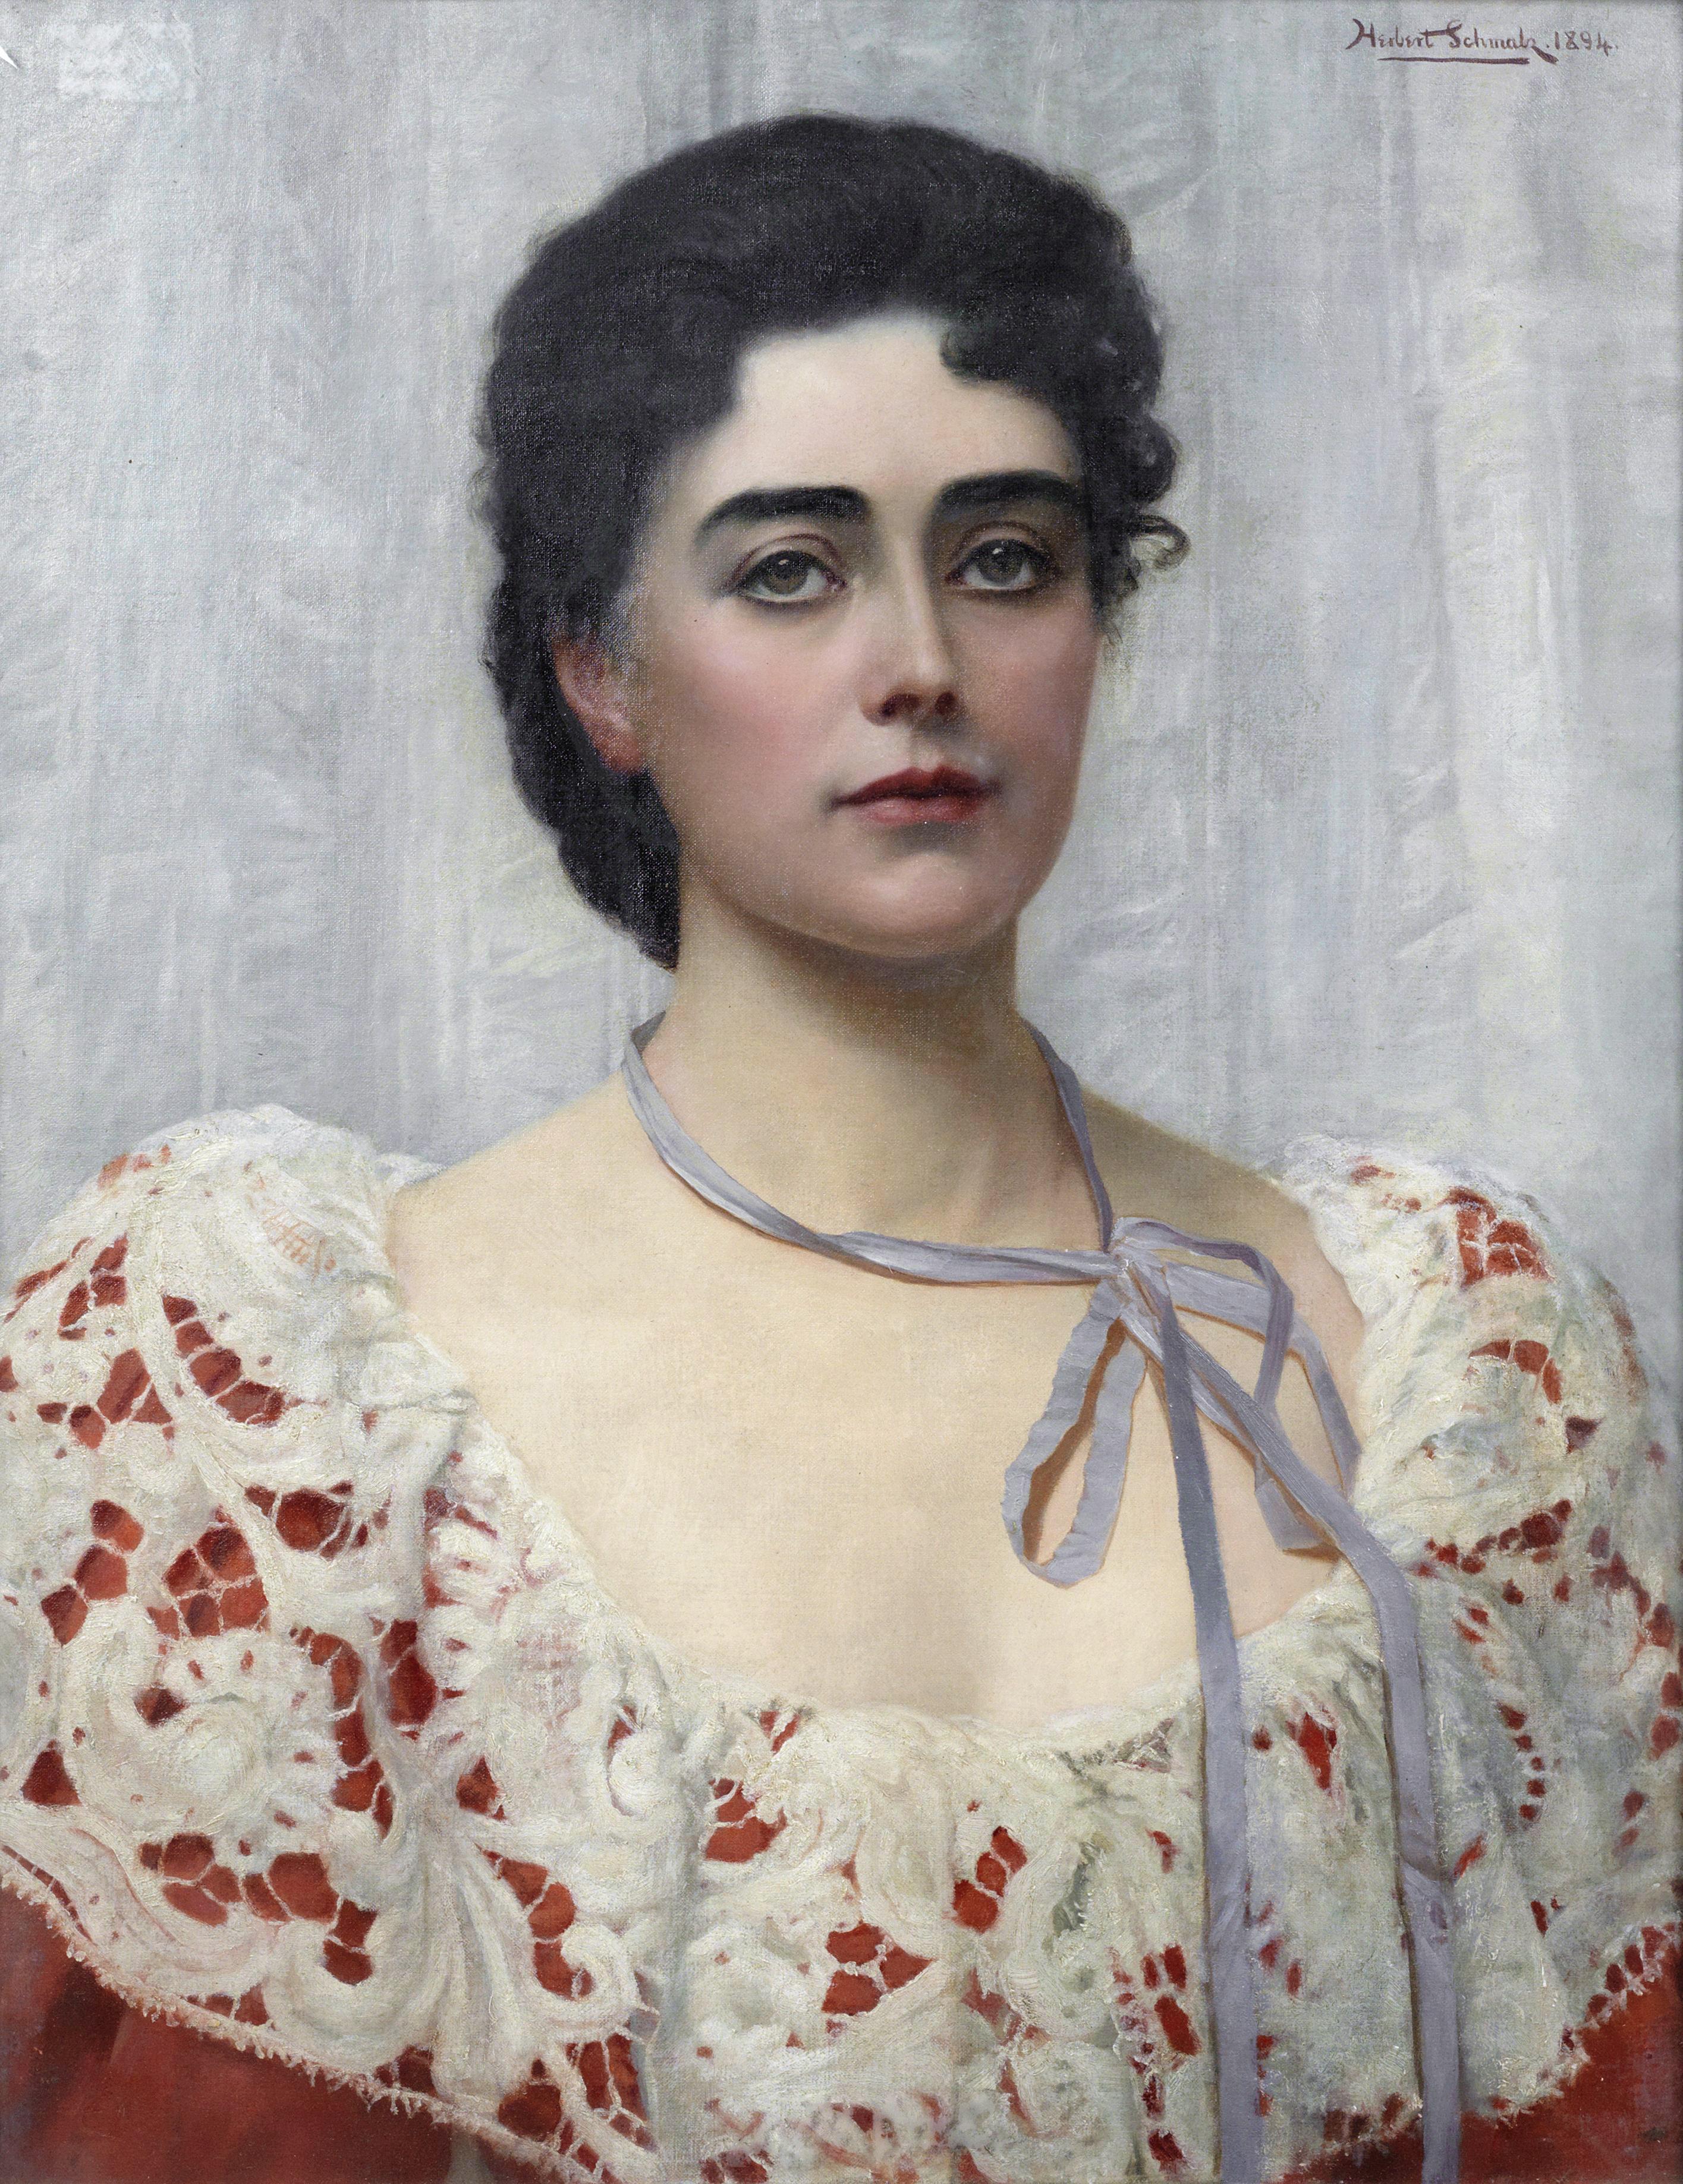 Image of Ethel Brilliana Tweedie from Wikidata